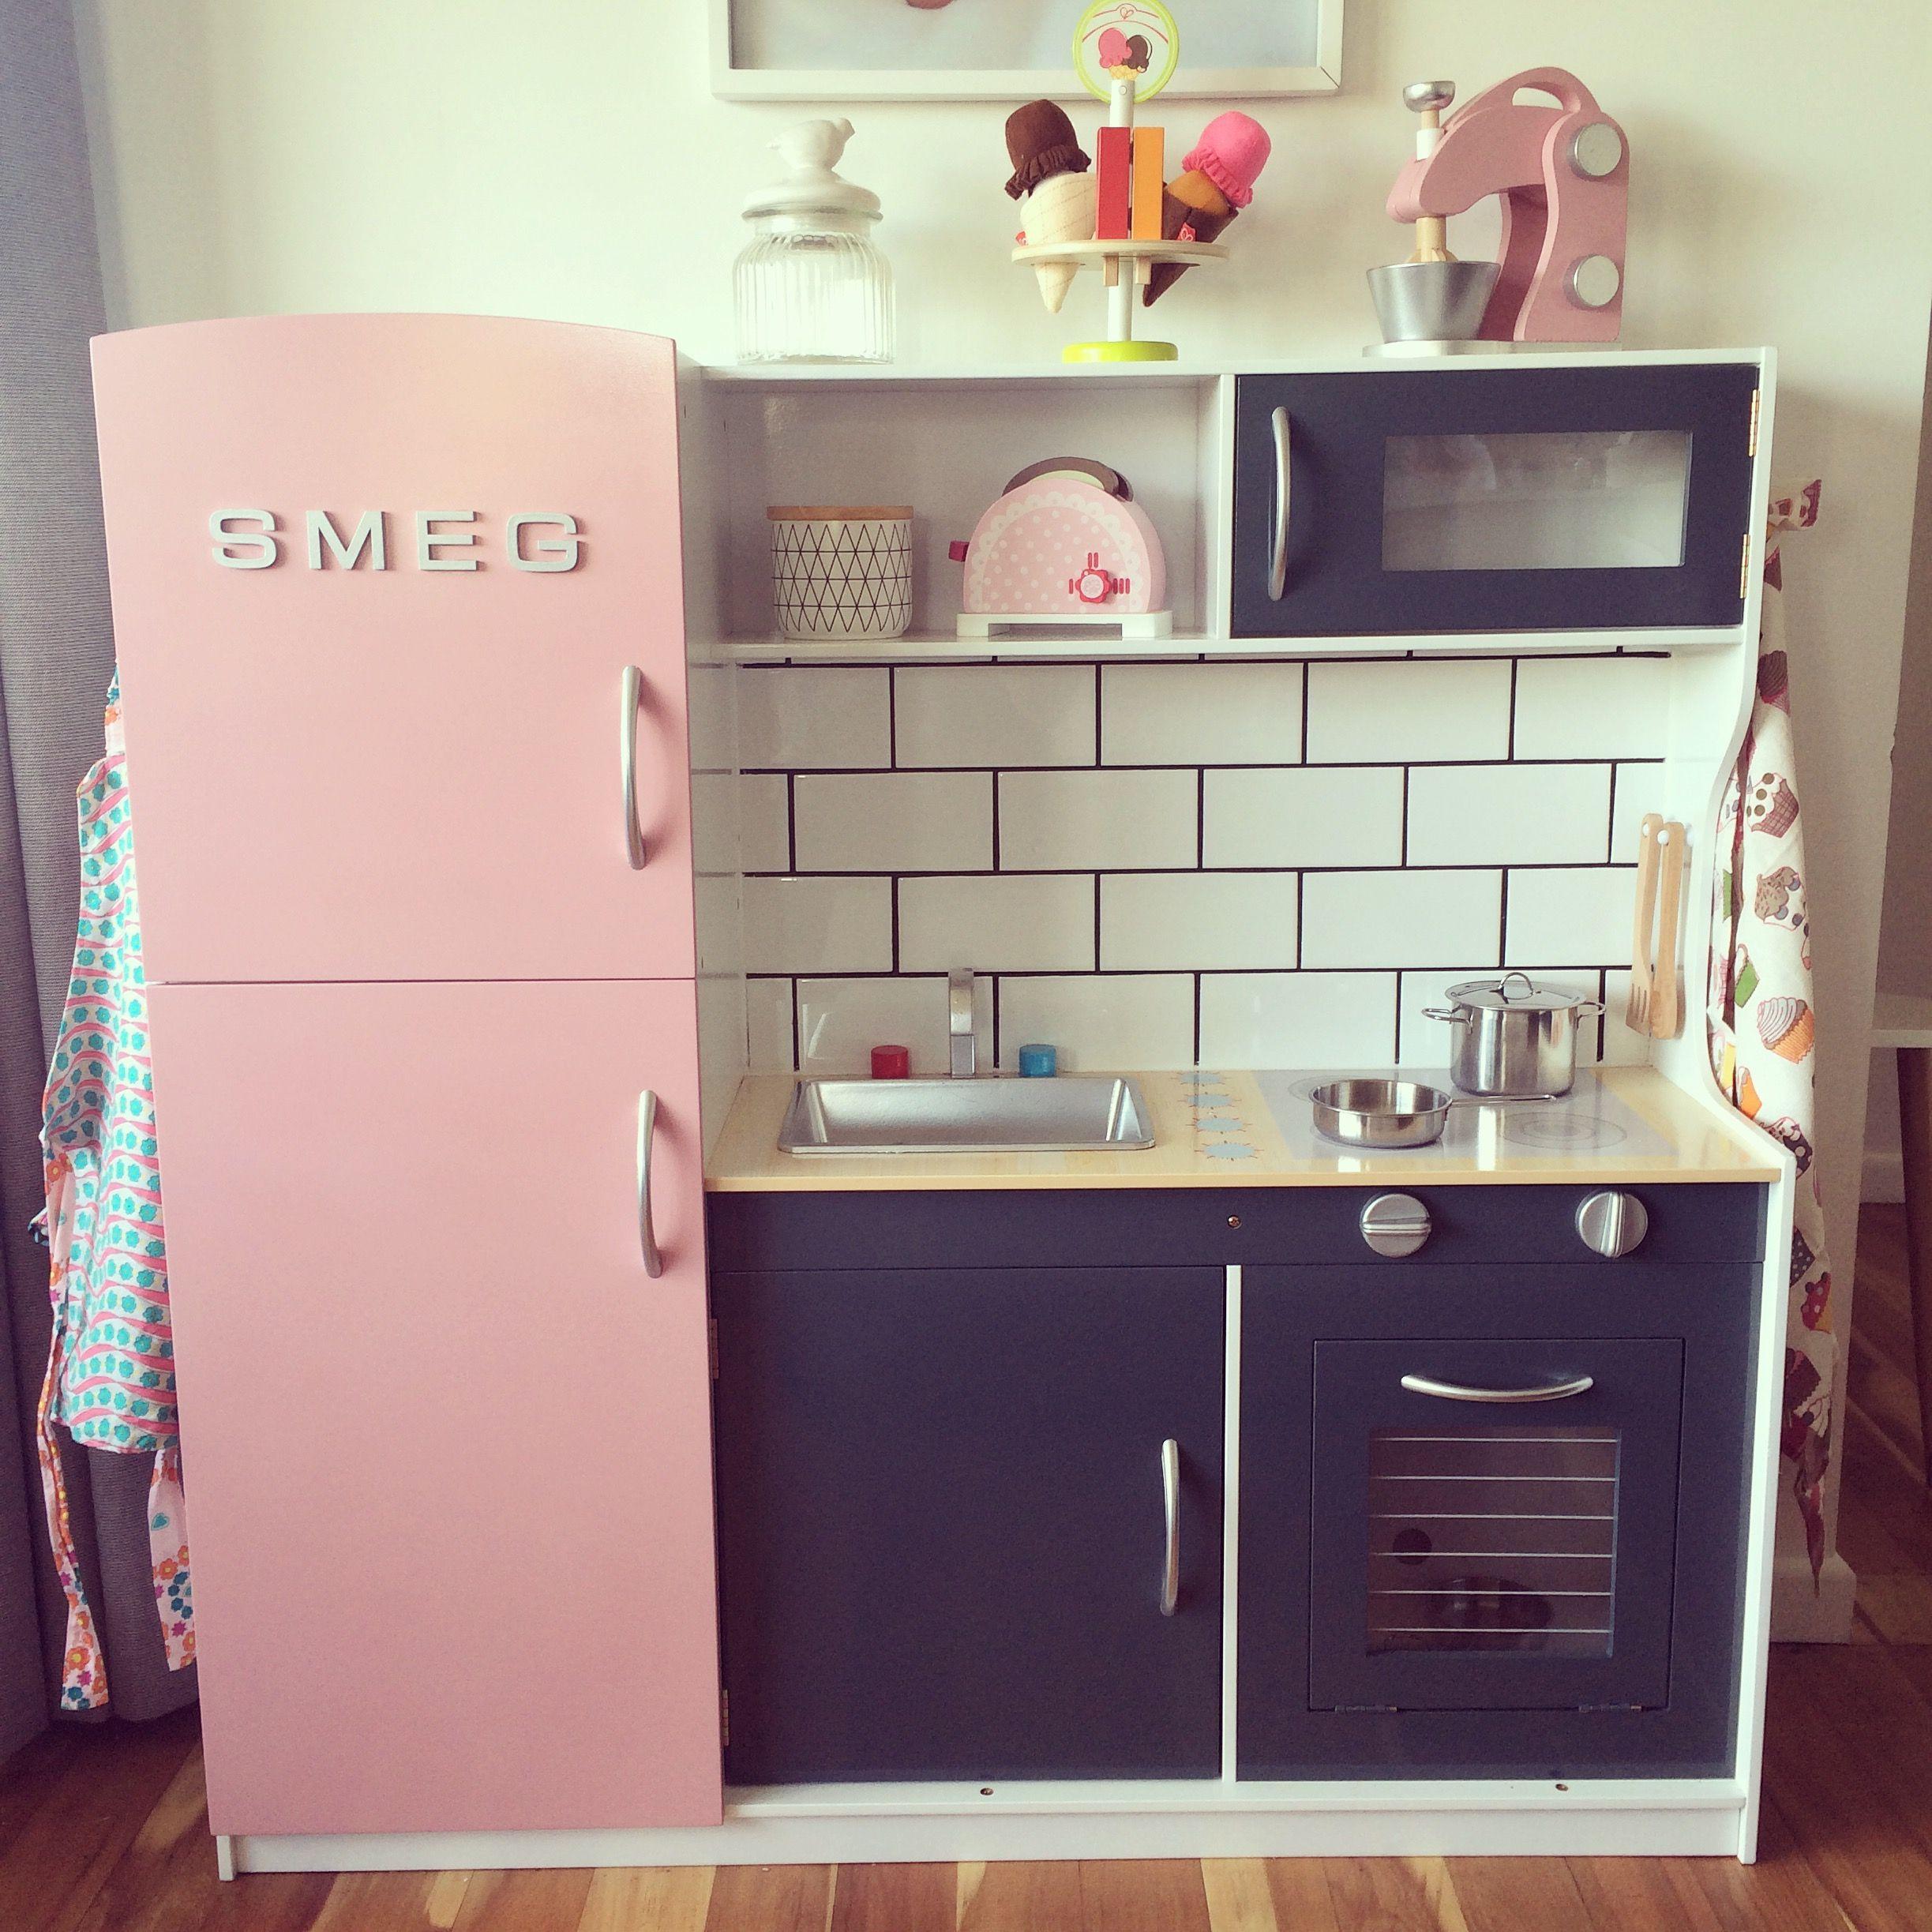 Kmart Kitchen Stainless Steel Double Sink Undermount Our Kids Hack Diy Furniture Ikea